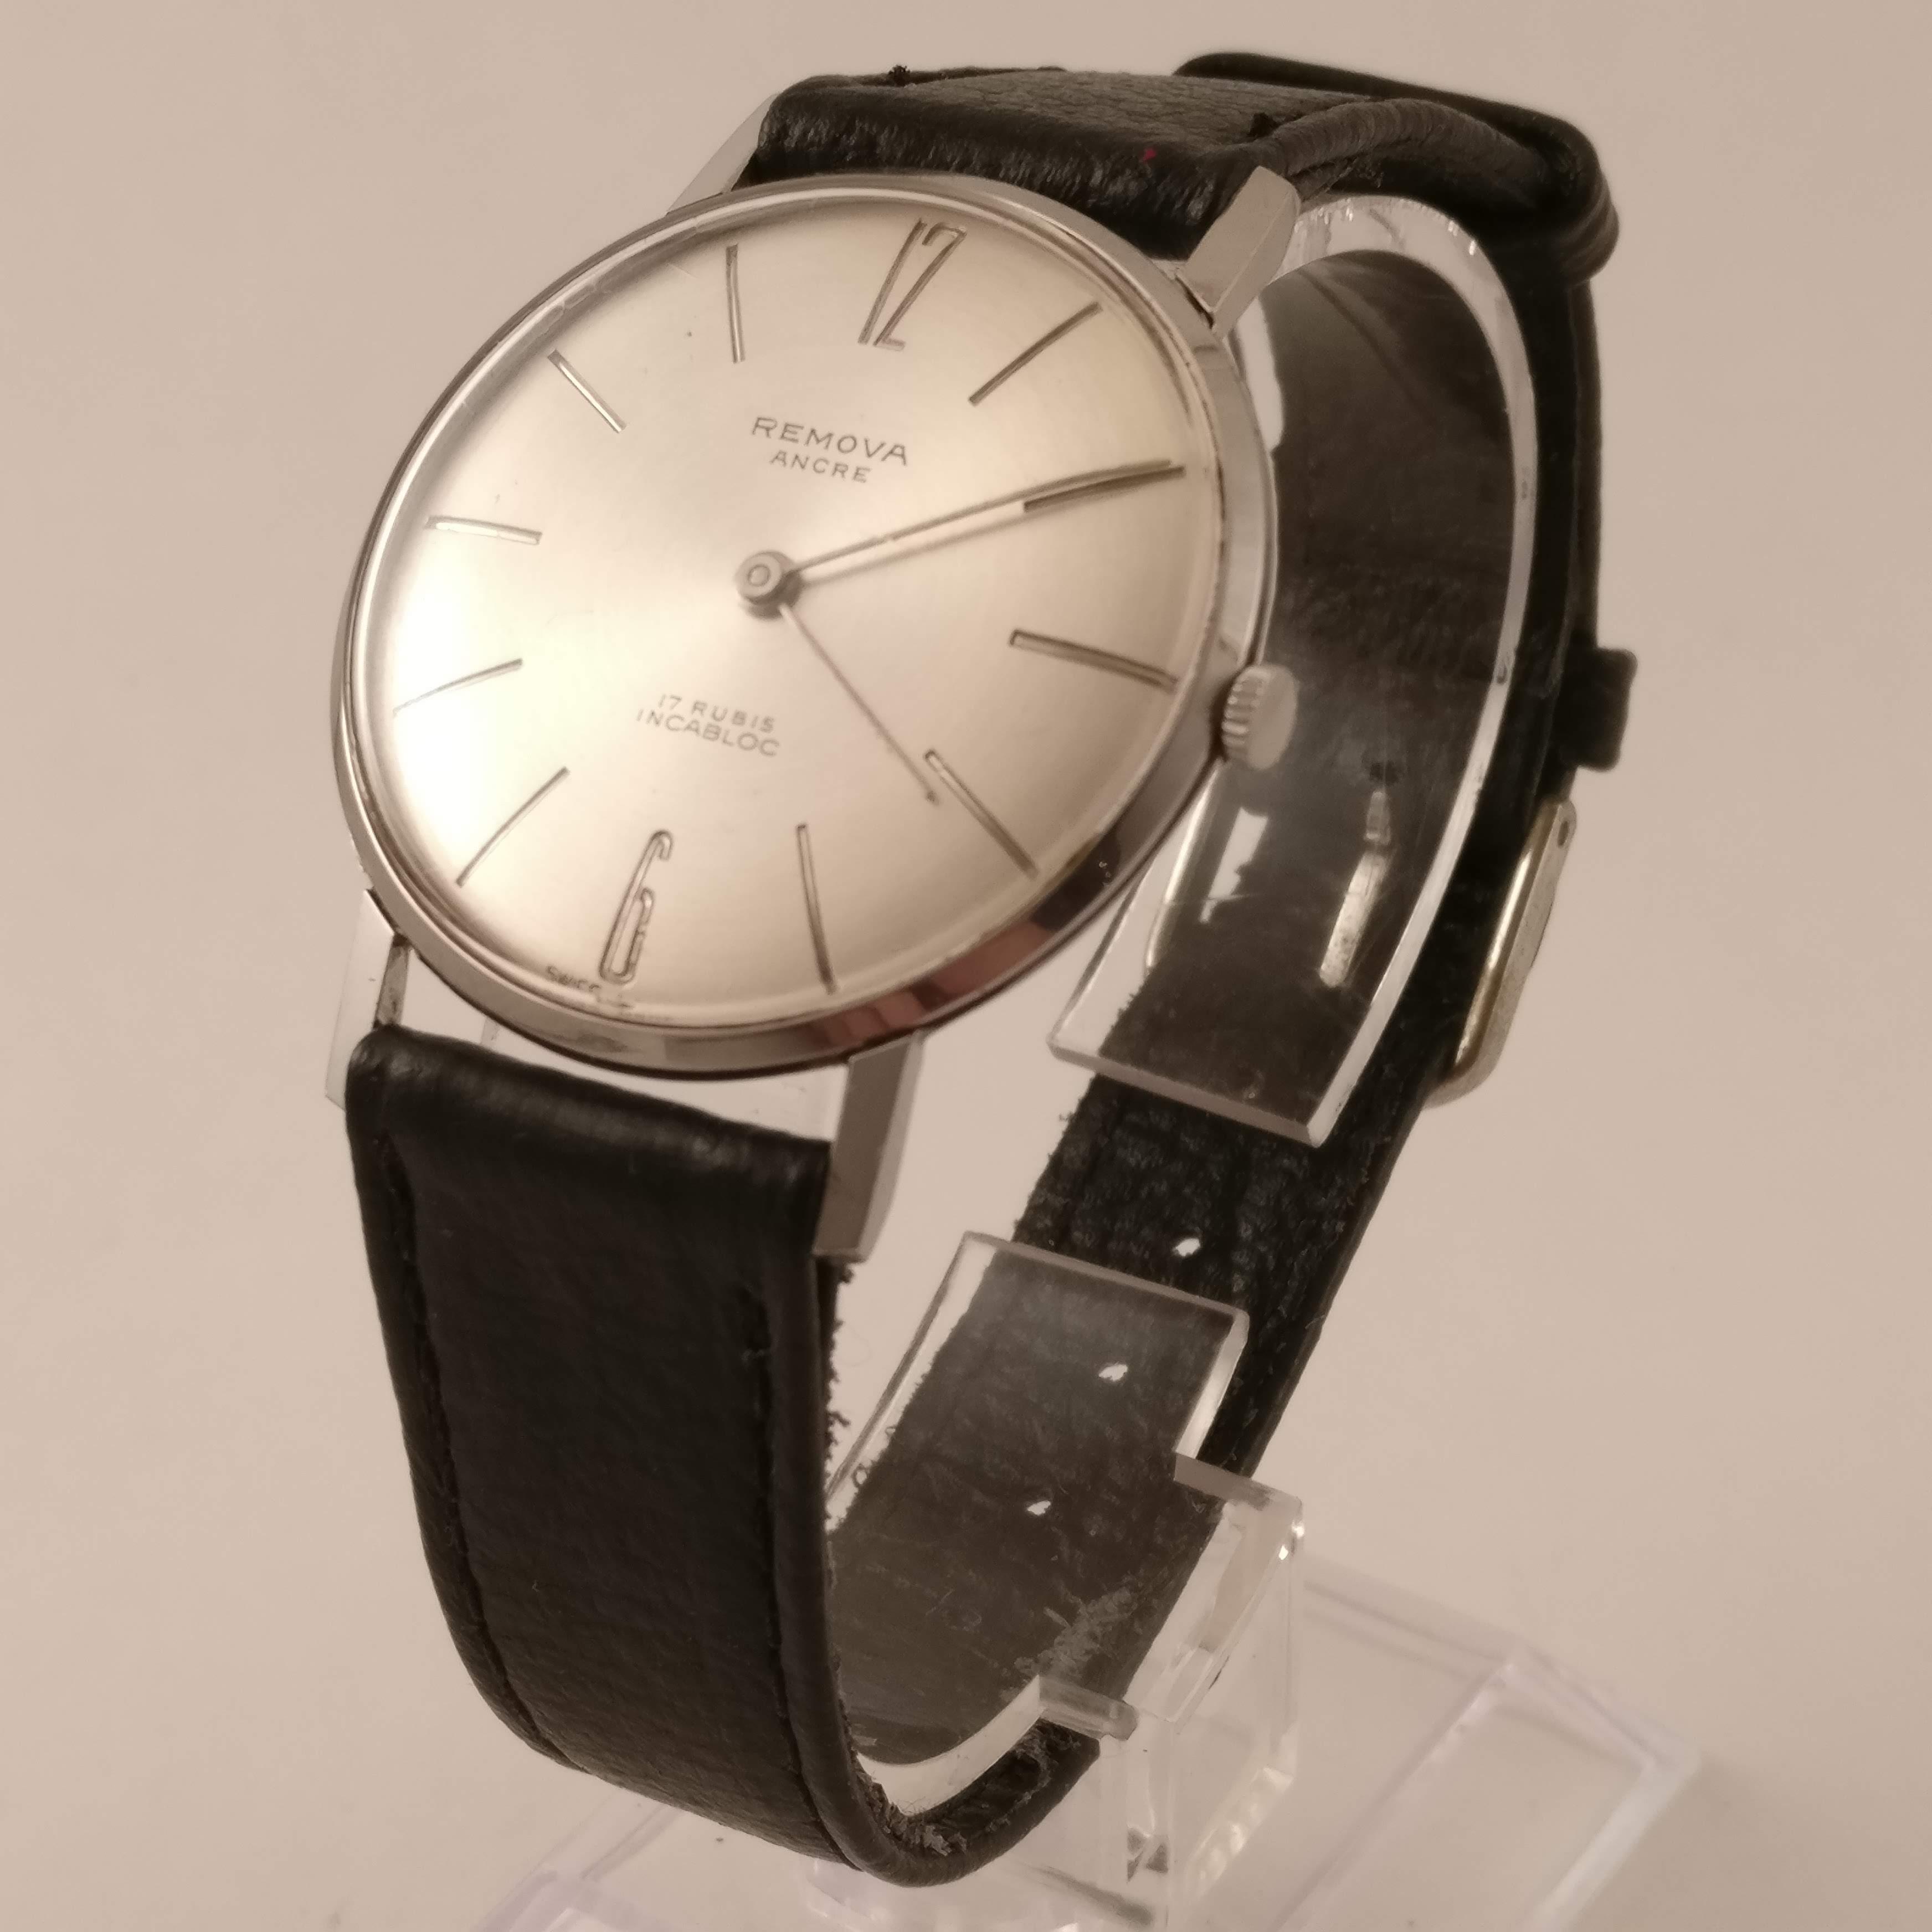 Remova Vintage Heren Horloge